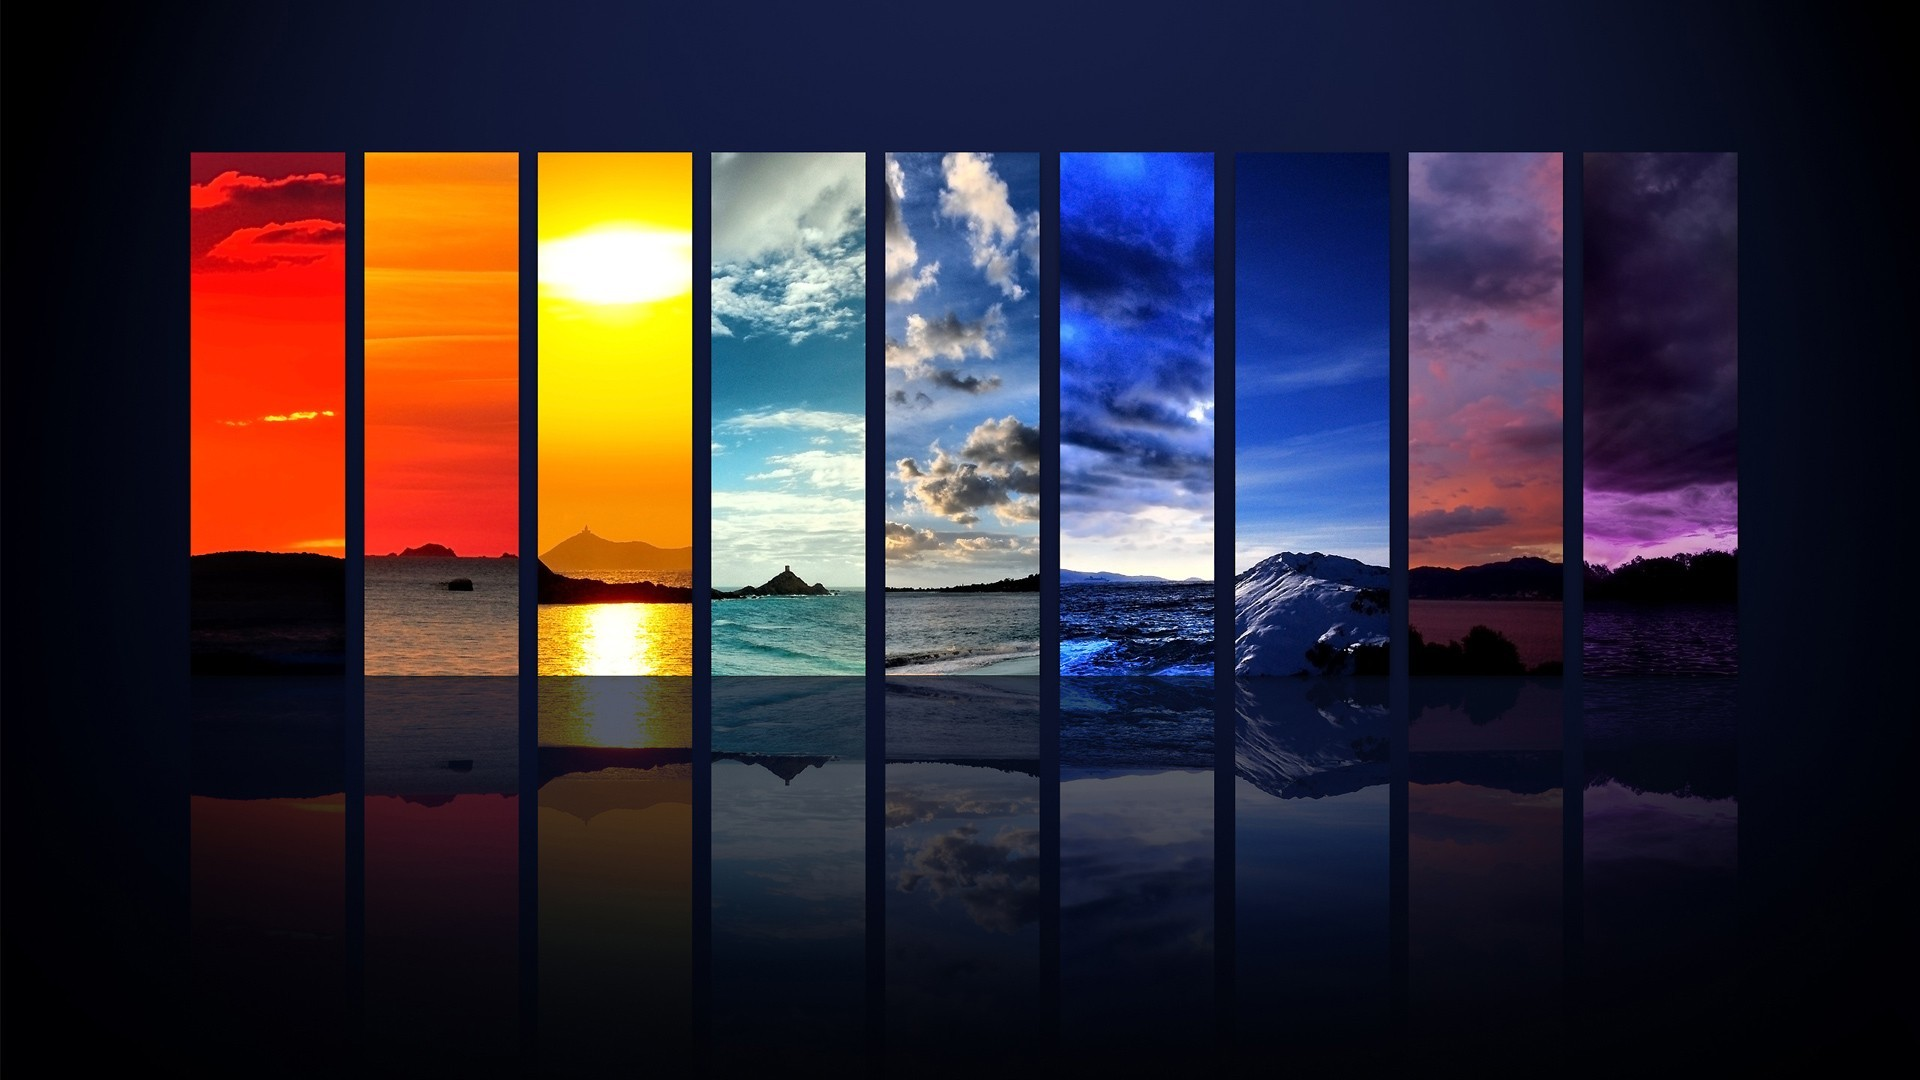 Cool Desktop Wallpaper